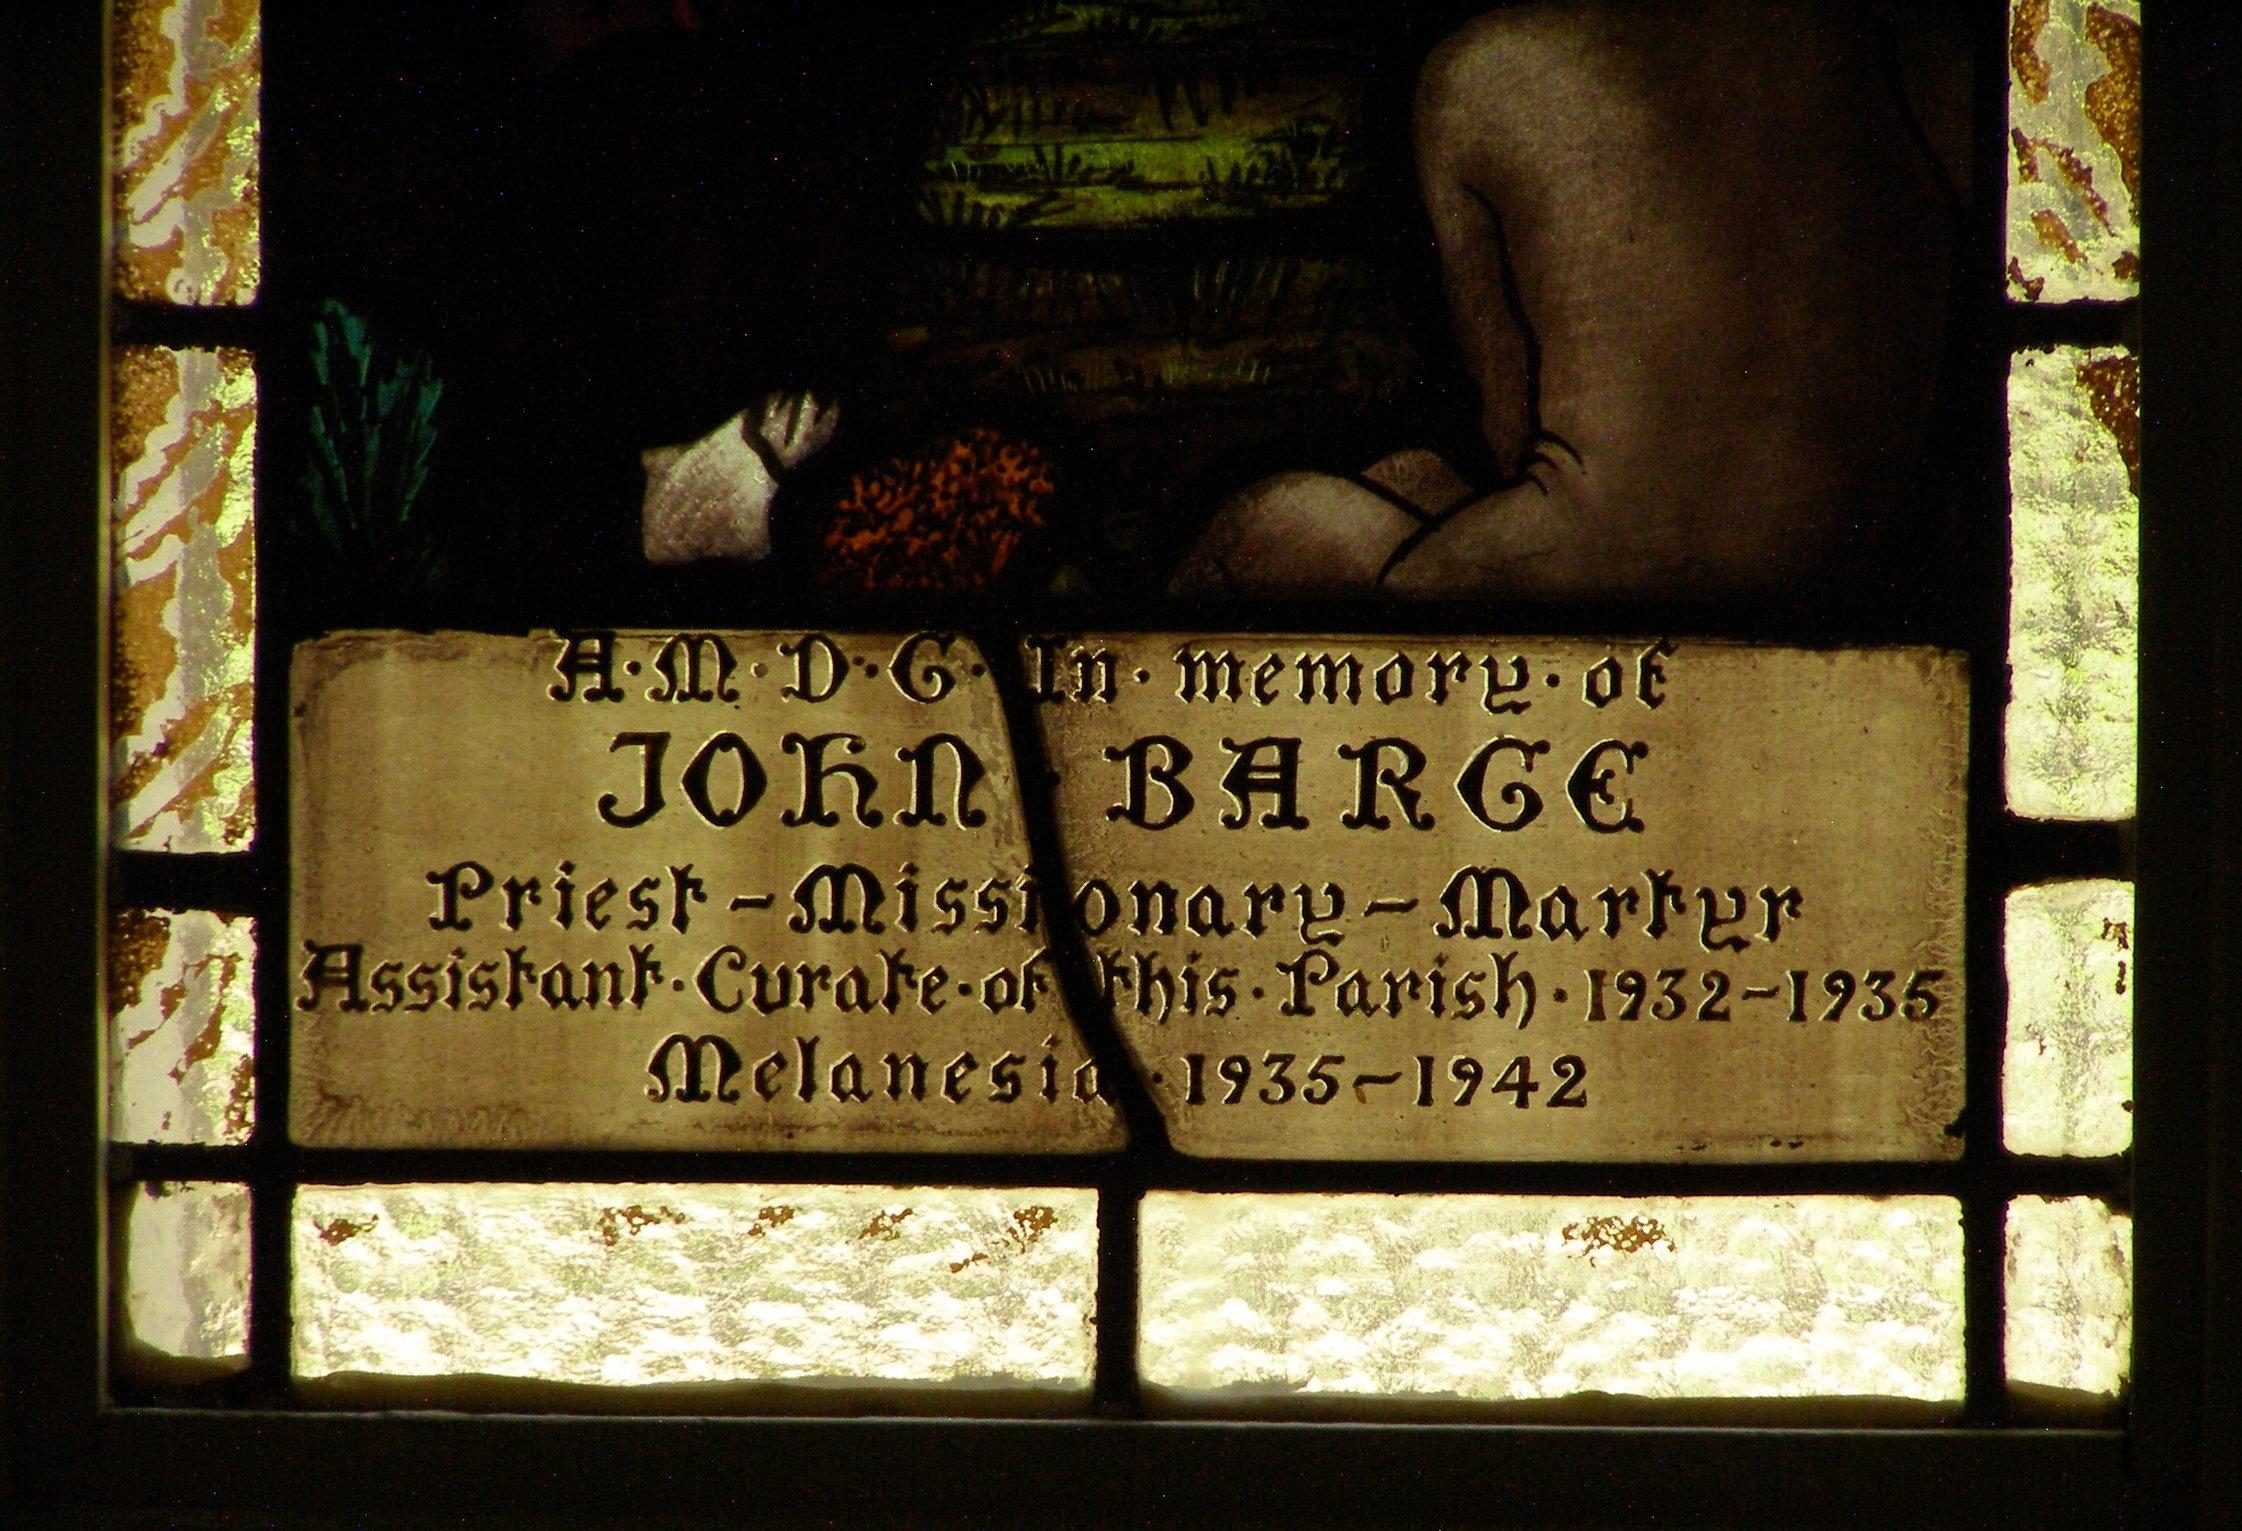 St James windows-1997.JPG